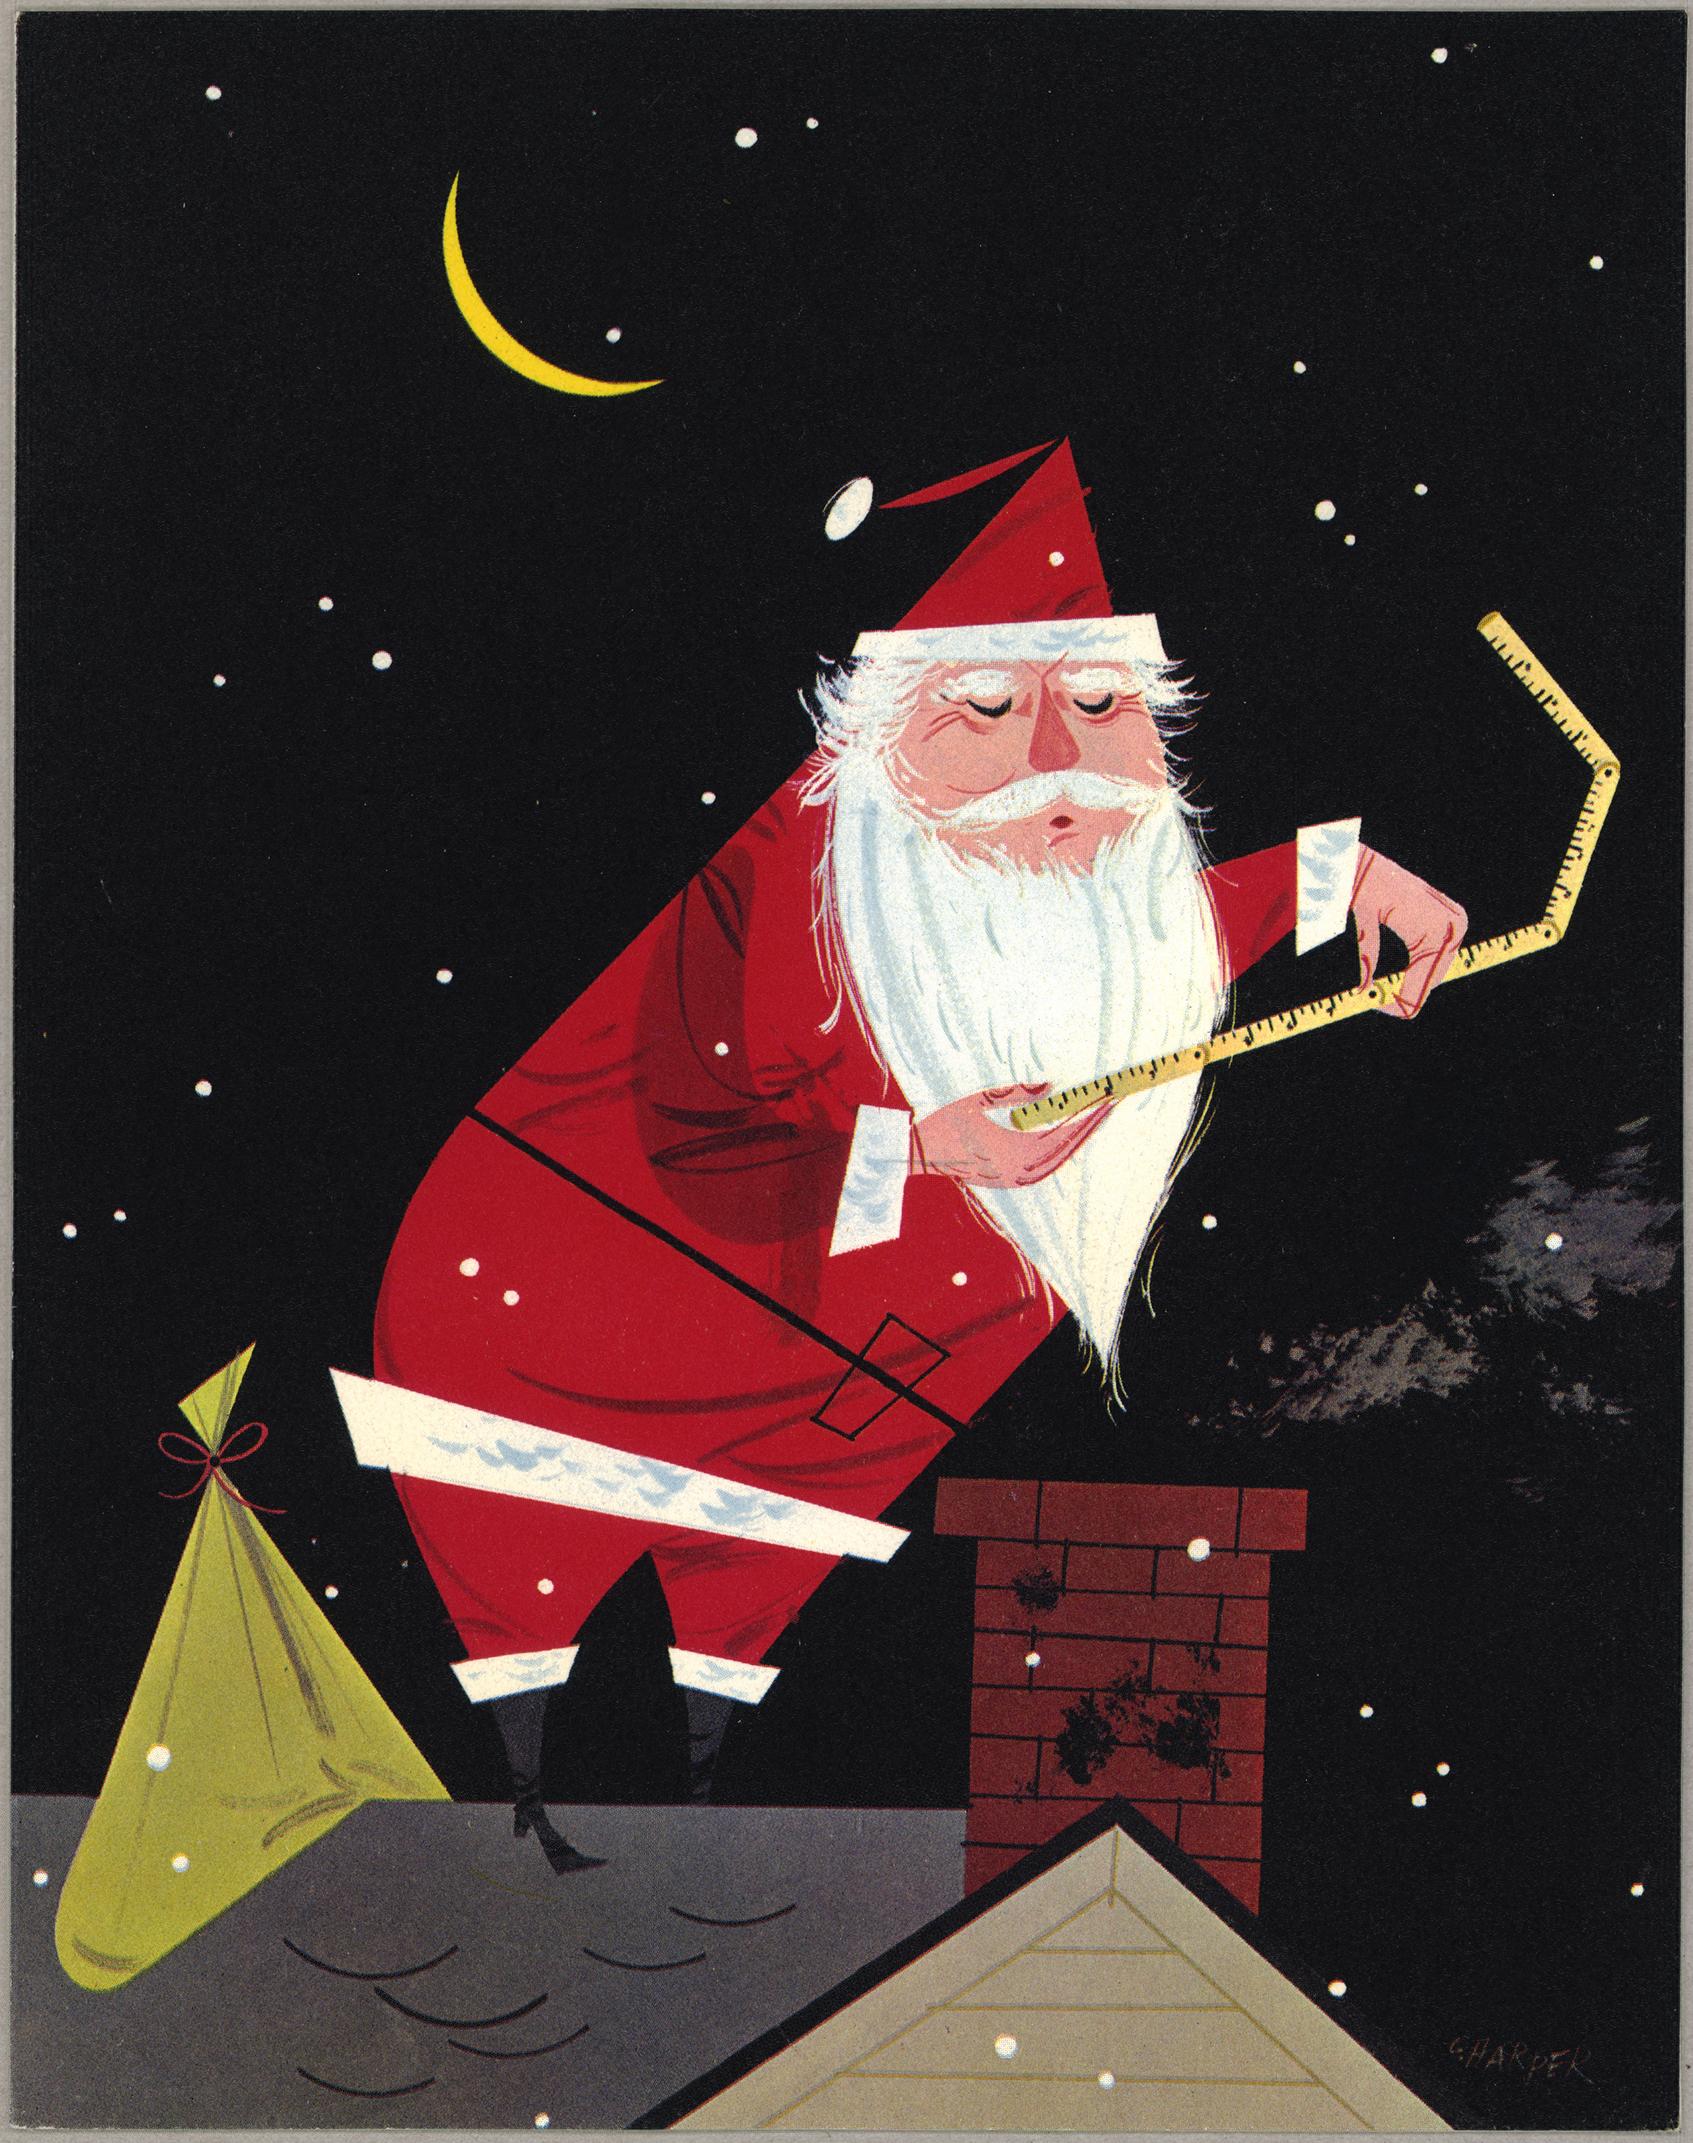 Celebrating Christmas | The Charley Harper Gallery